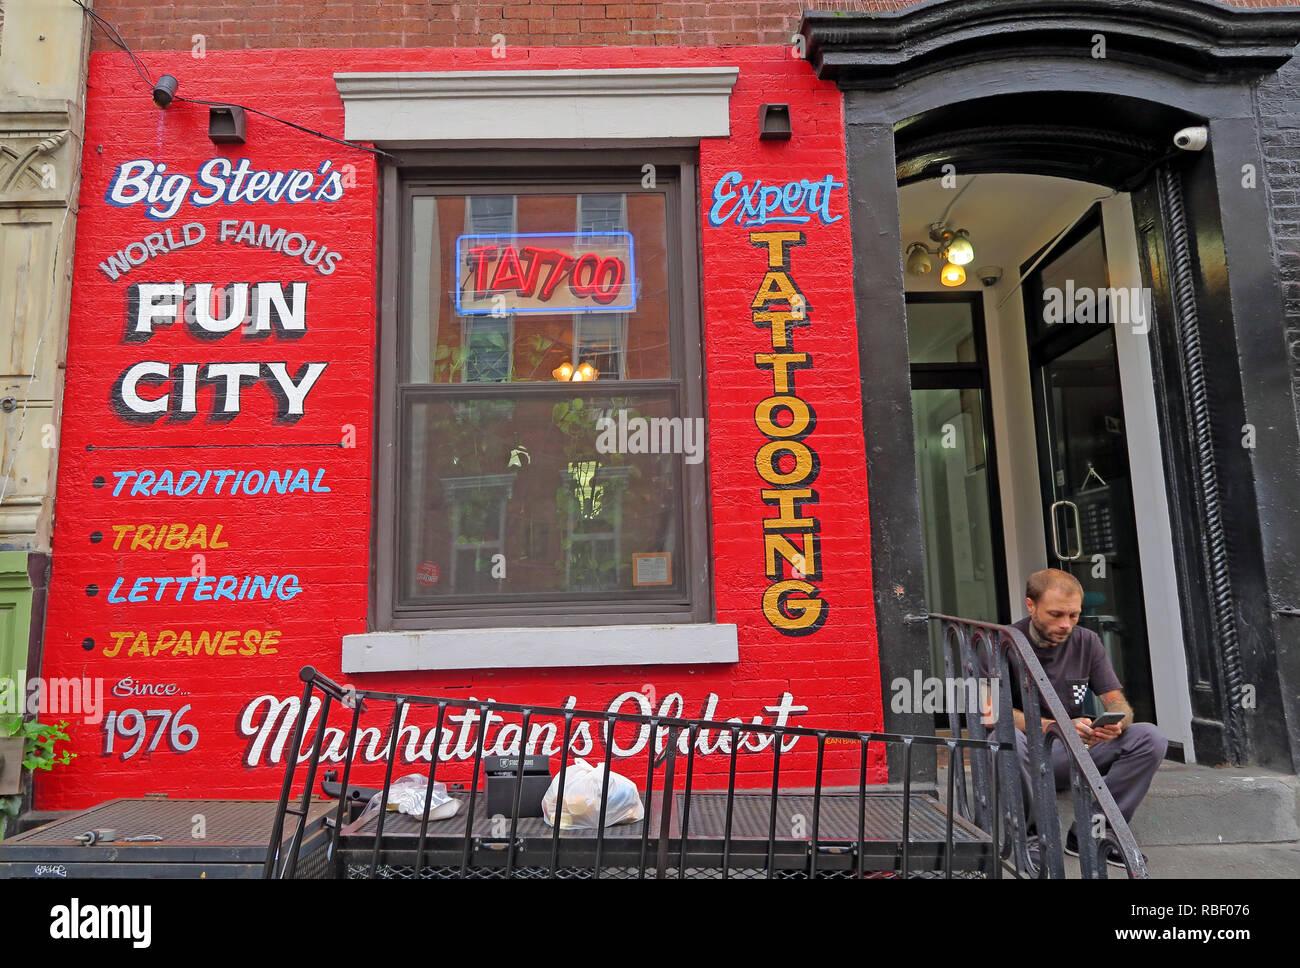 GoTonySmith,@HotpixUK,HotpixUK,NOHO NYC,NYC,New York City,St Marks Place,St Marks Place NYC,street,New York Street,USA,America,City Centre,city,centre,center,city center,Eastvillage,New York Travel Tourism,store,stores,East Village tattoo,expert,red